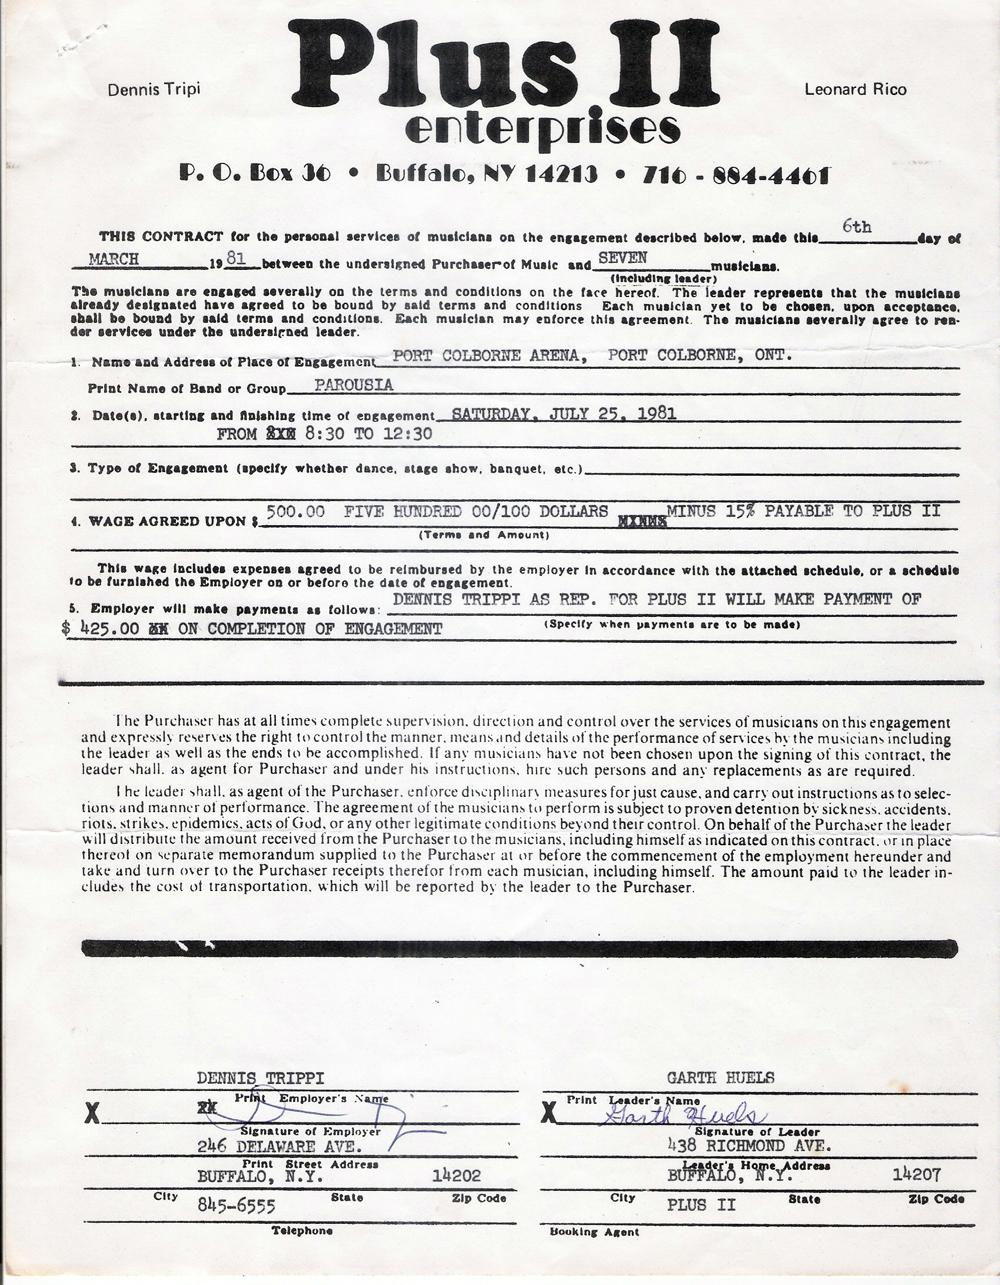 Plus II contract - Original Contract Garth Huels March 1981